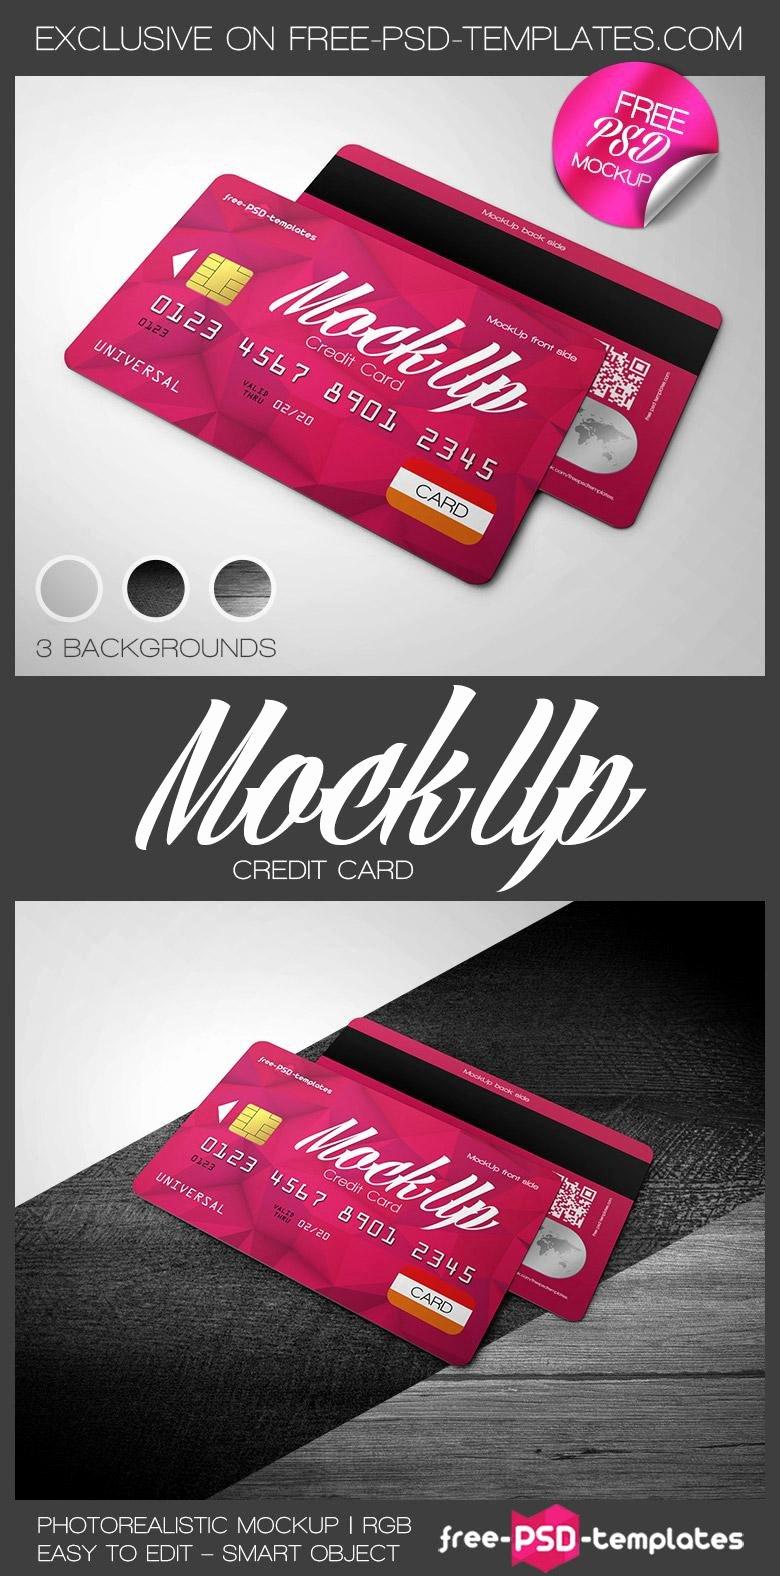 Credit Card Mockup Psd Unique Credit Card Mockup Psd